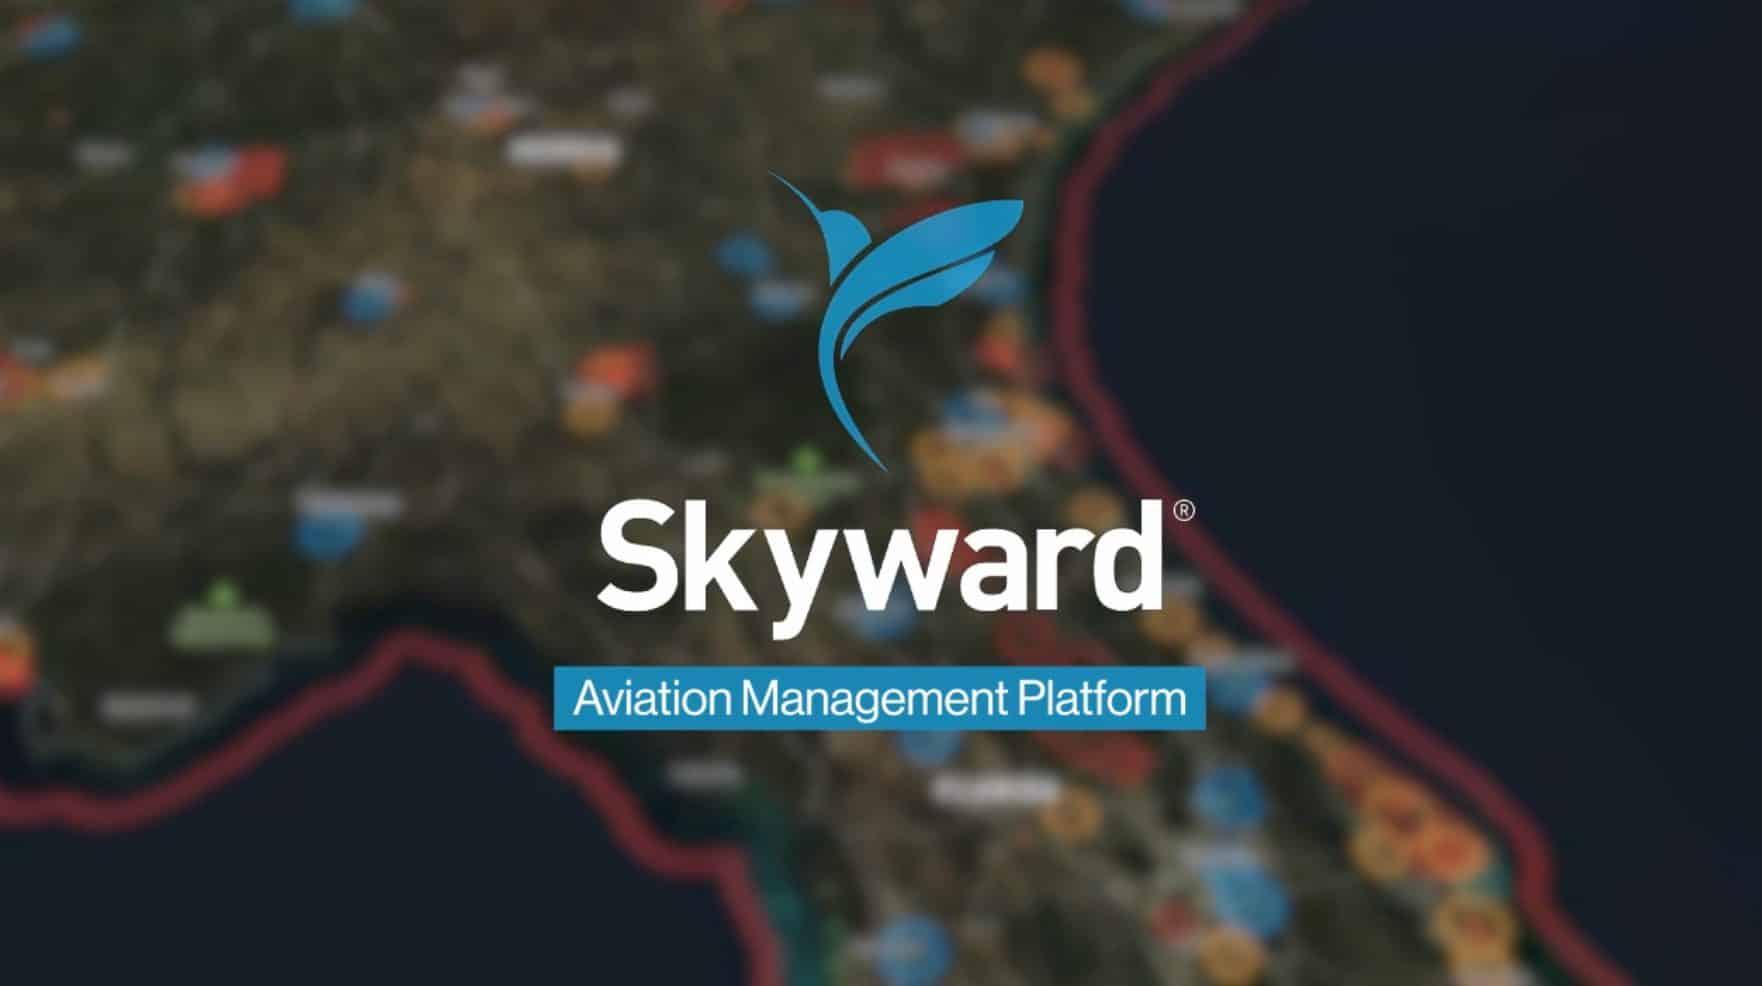 Verizon's Skyward abandons drone testing plans in North Portland